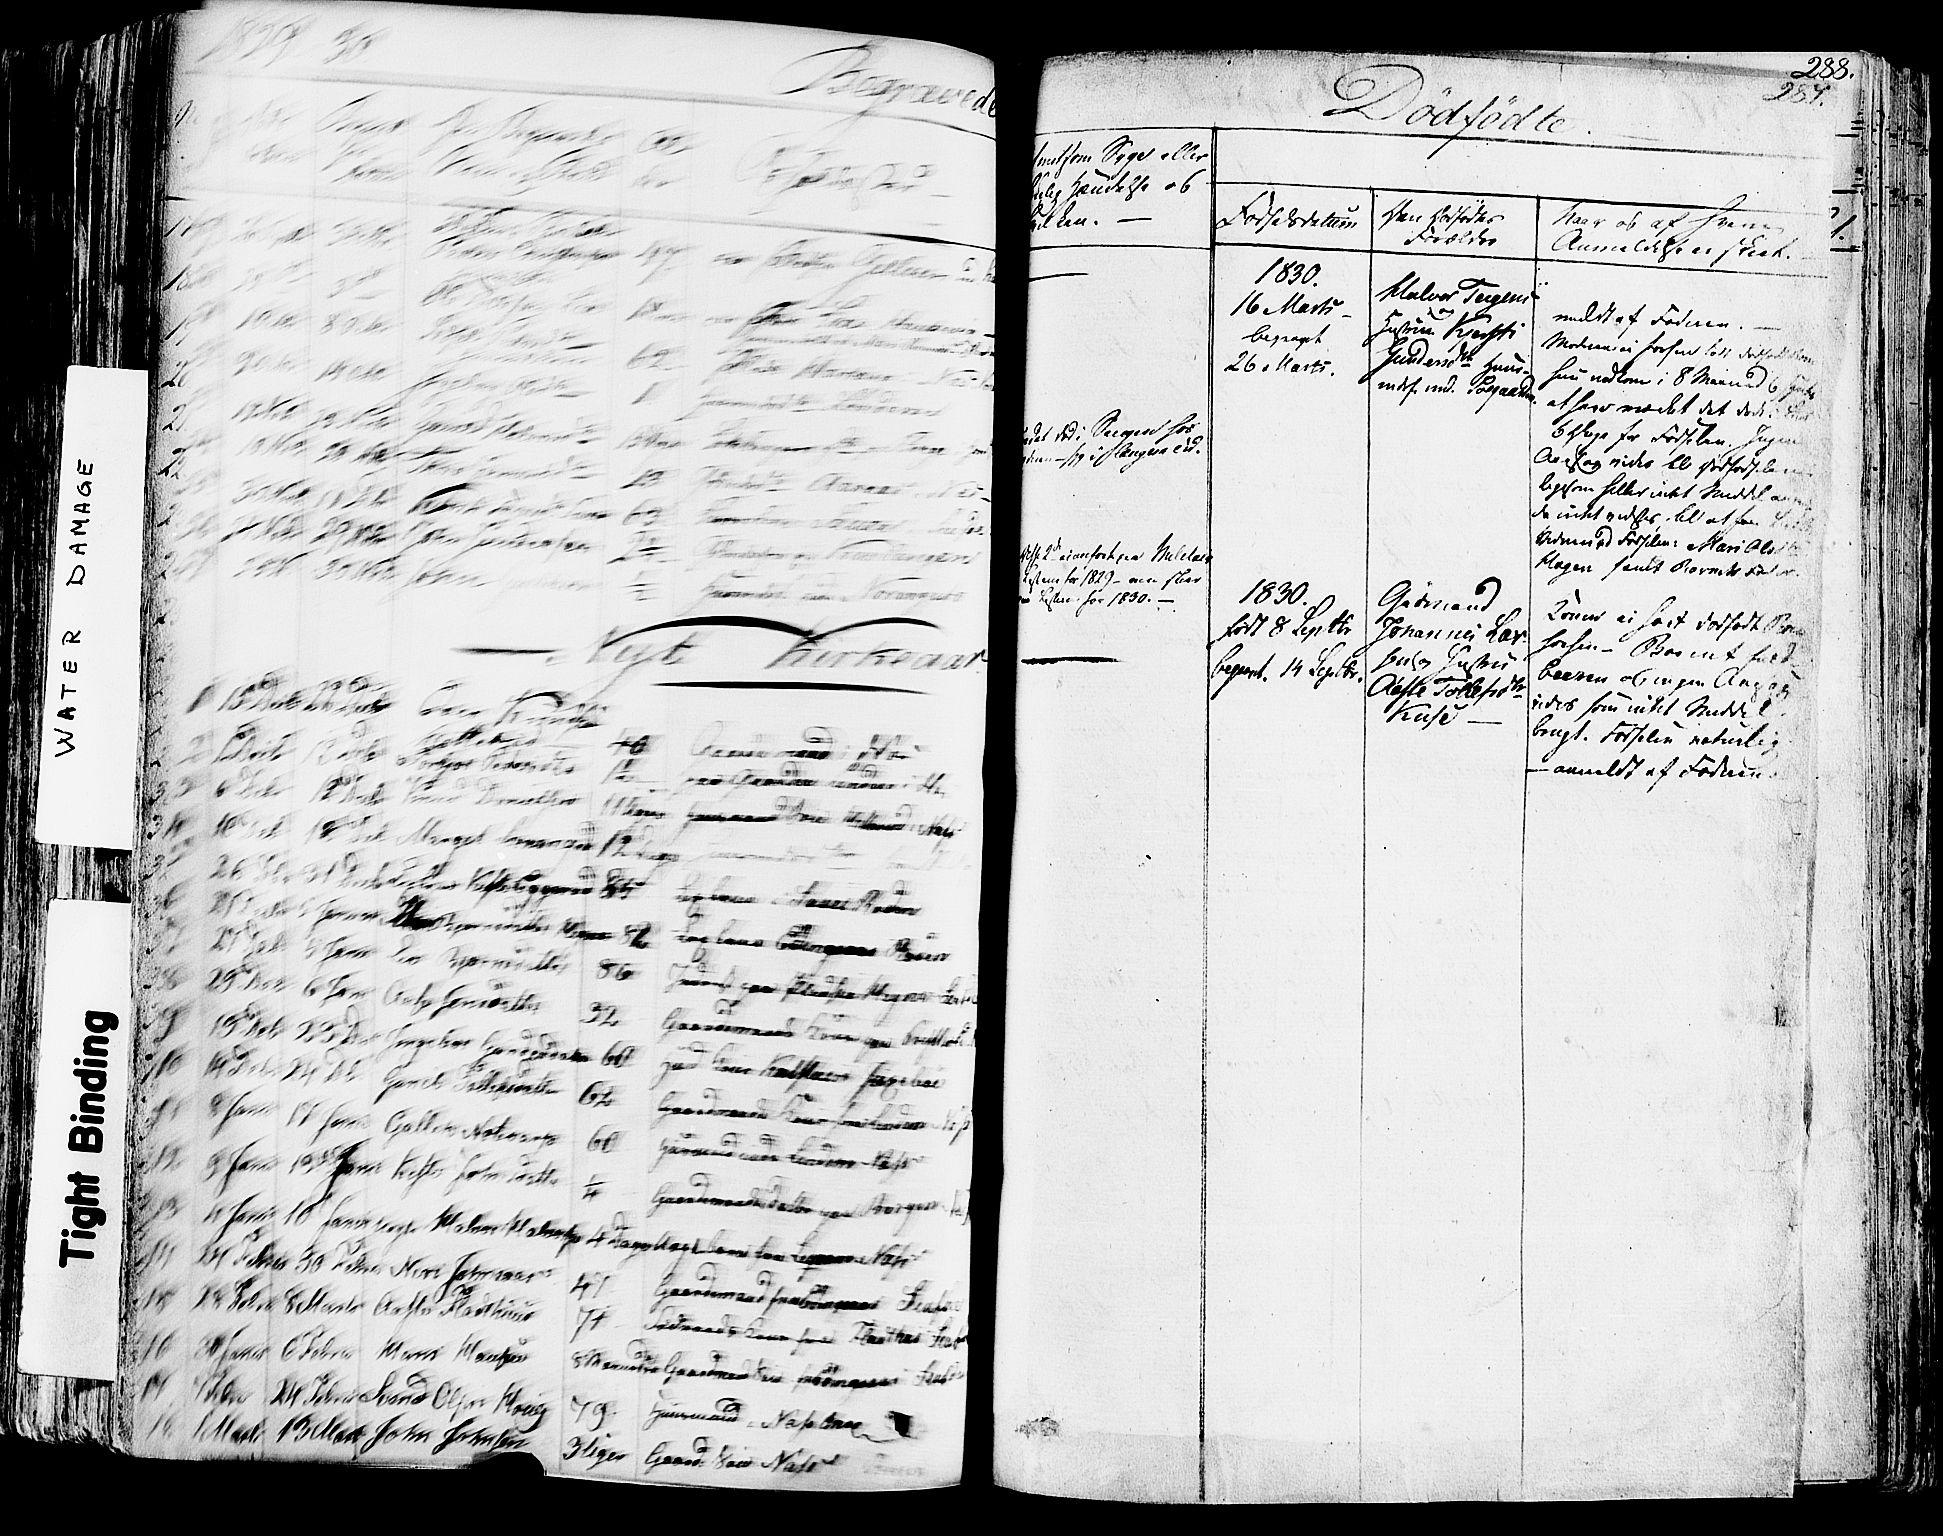 SAKO, Sauherad kirkebøker, F/Fa/L0006: Ministerialbok nr. I 6, 1827-1850, s. 287